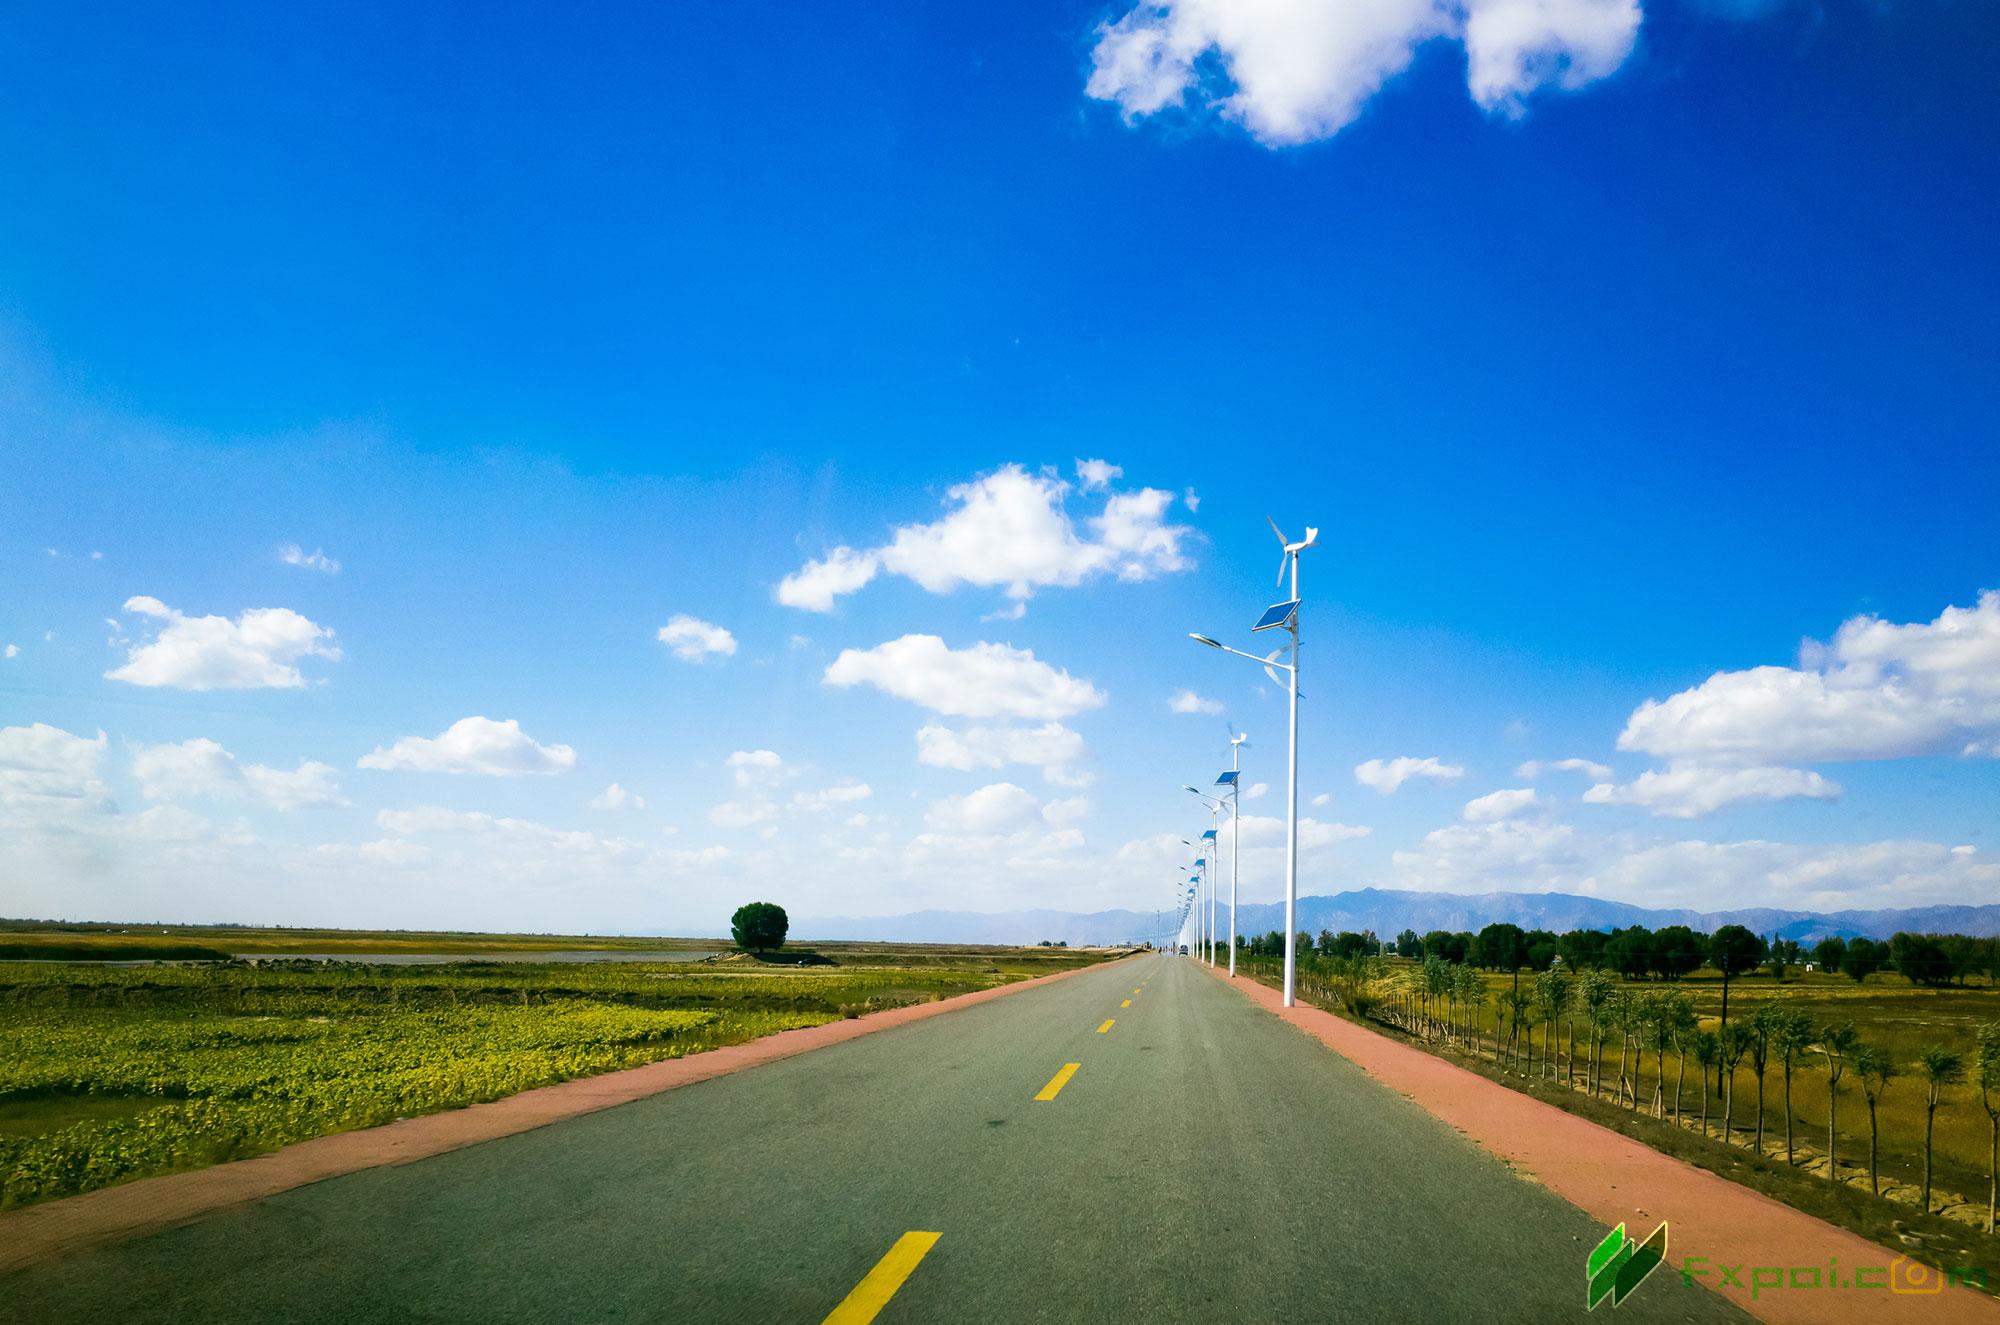 《On the Way》摄于内蒙古境内